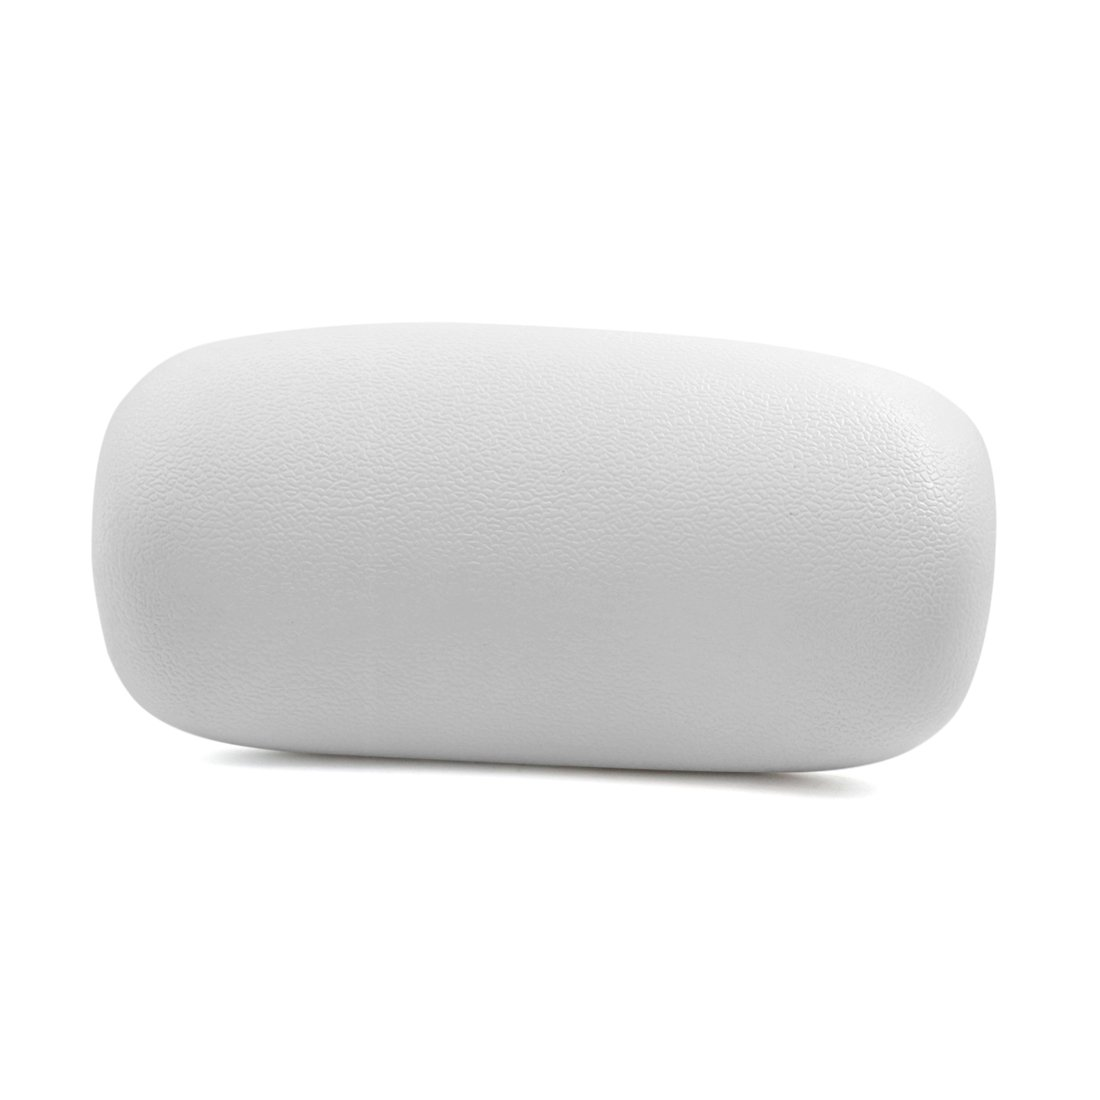 uxcell Luxurious Foam Padded Spa Bath Pillow Hot Tub Head Back Cushion 9 Inch x 5.3 Inch White a17030600ux0619